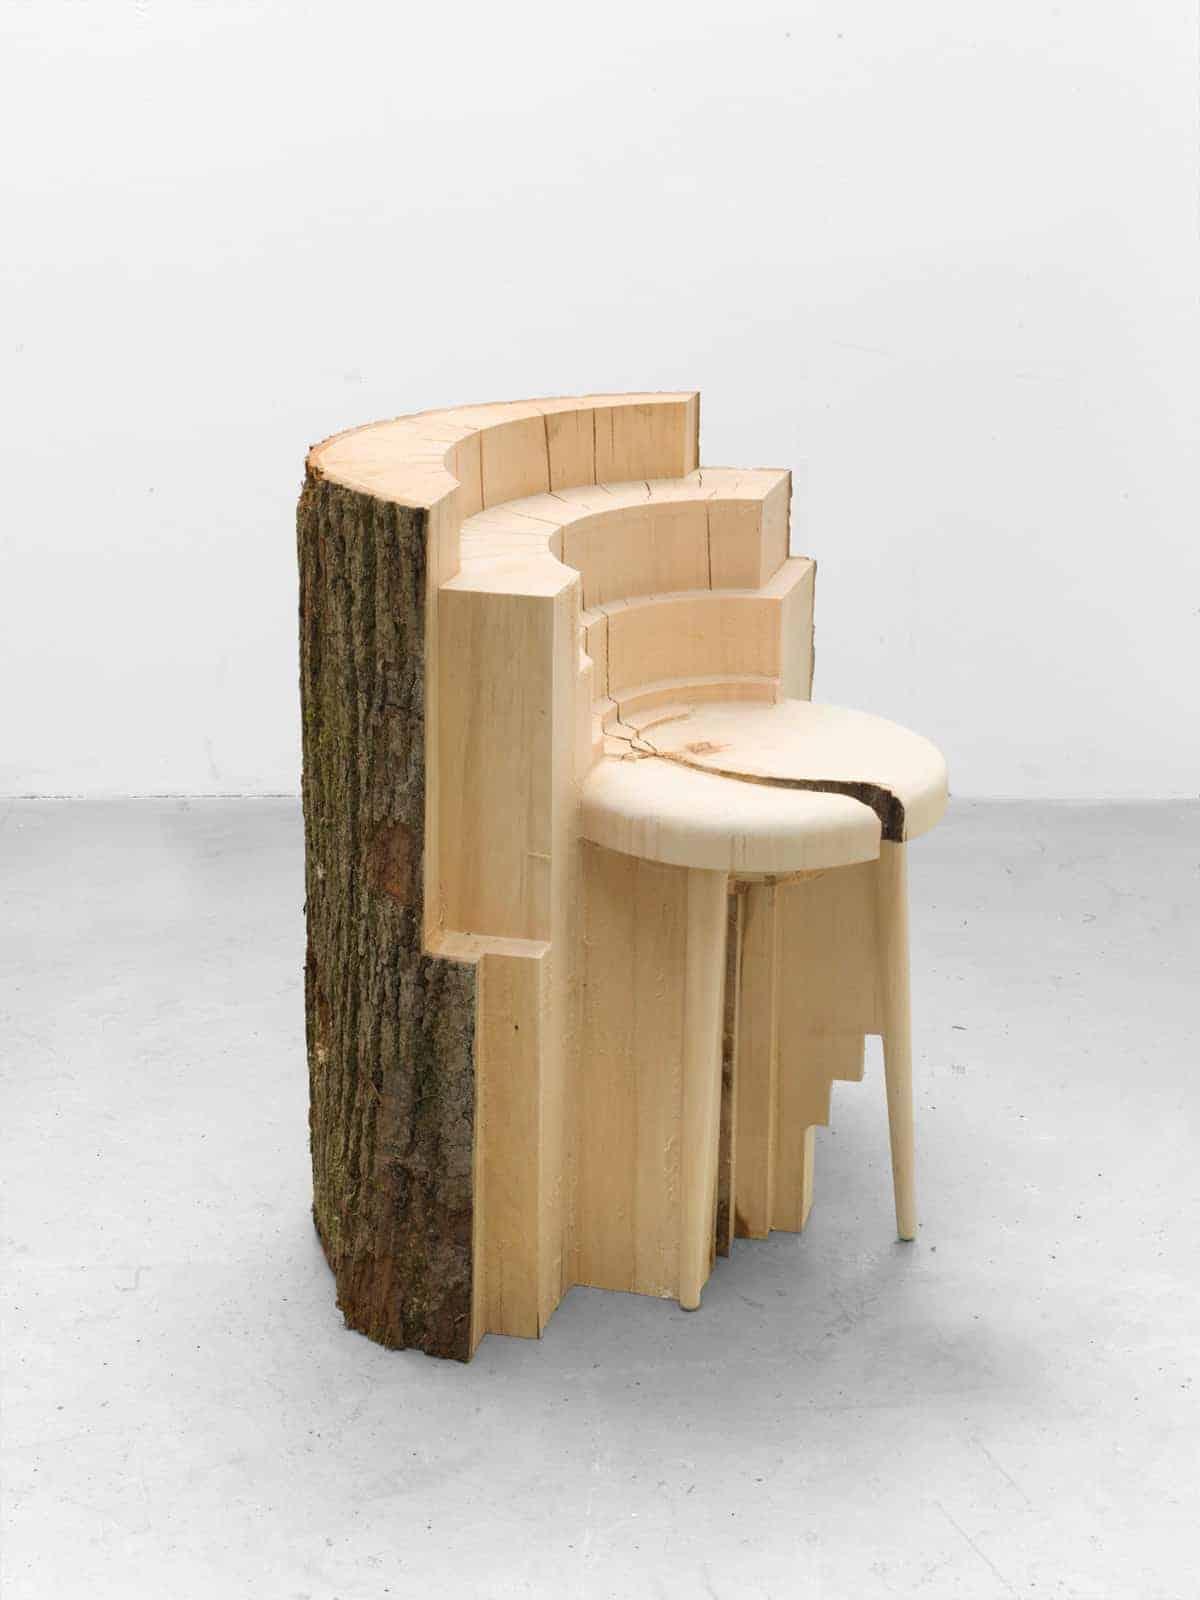 meubels uit hout